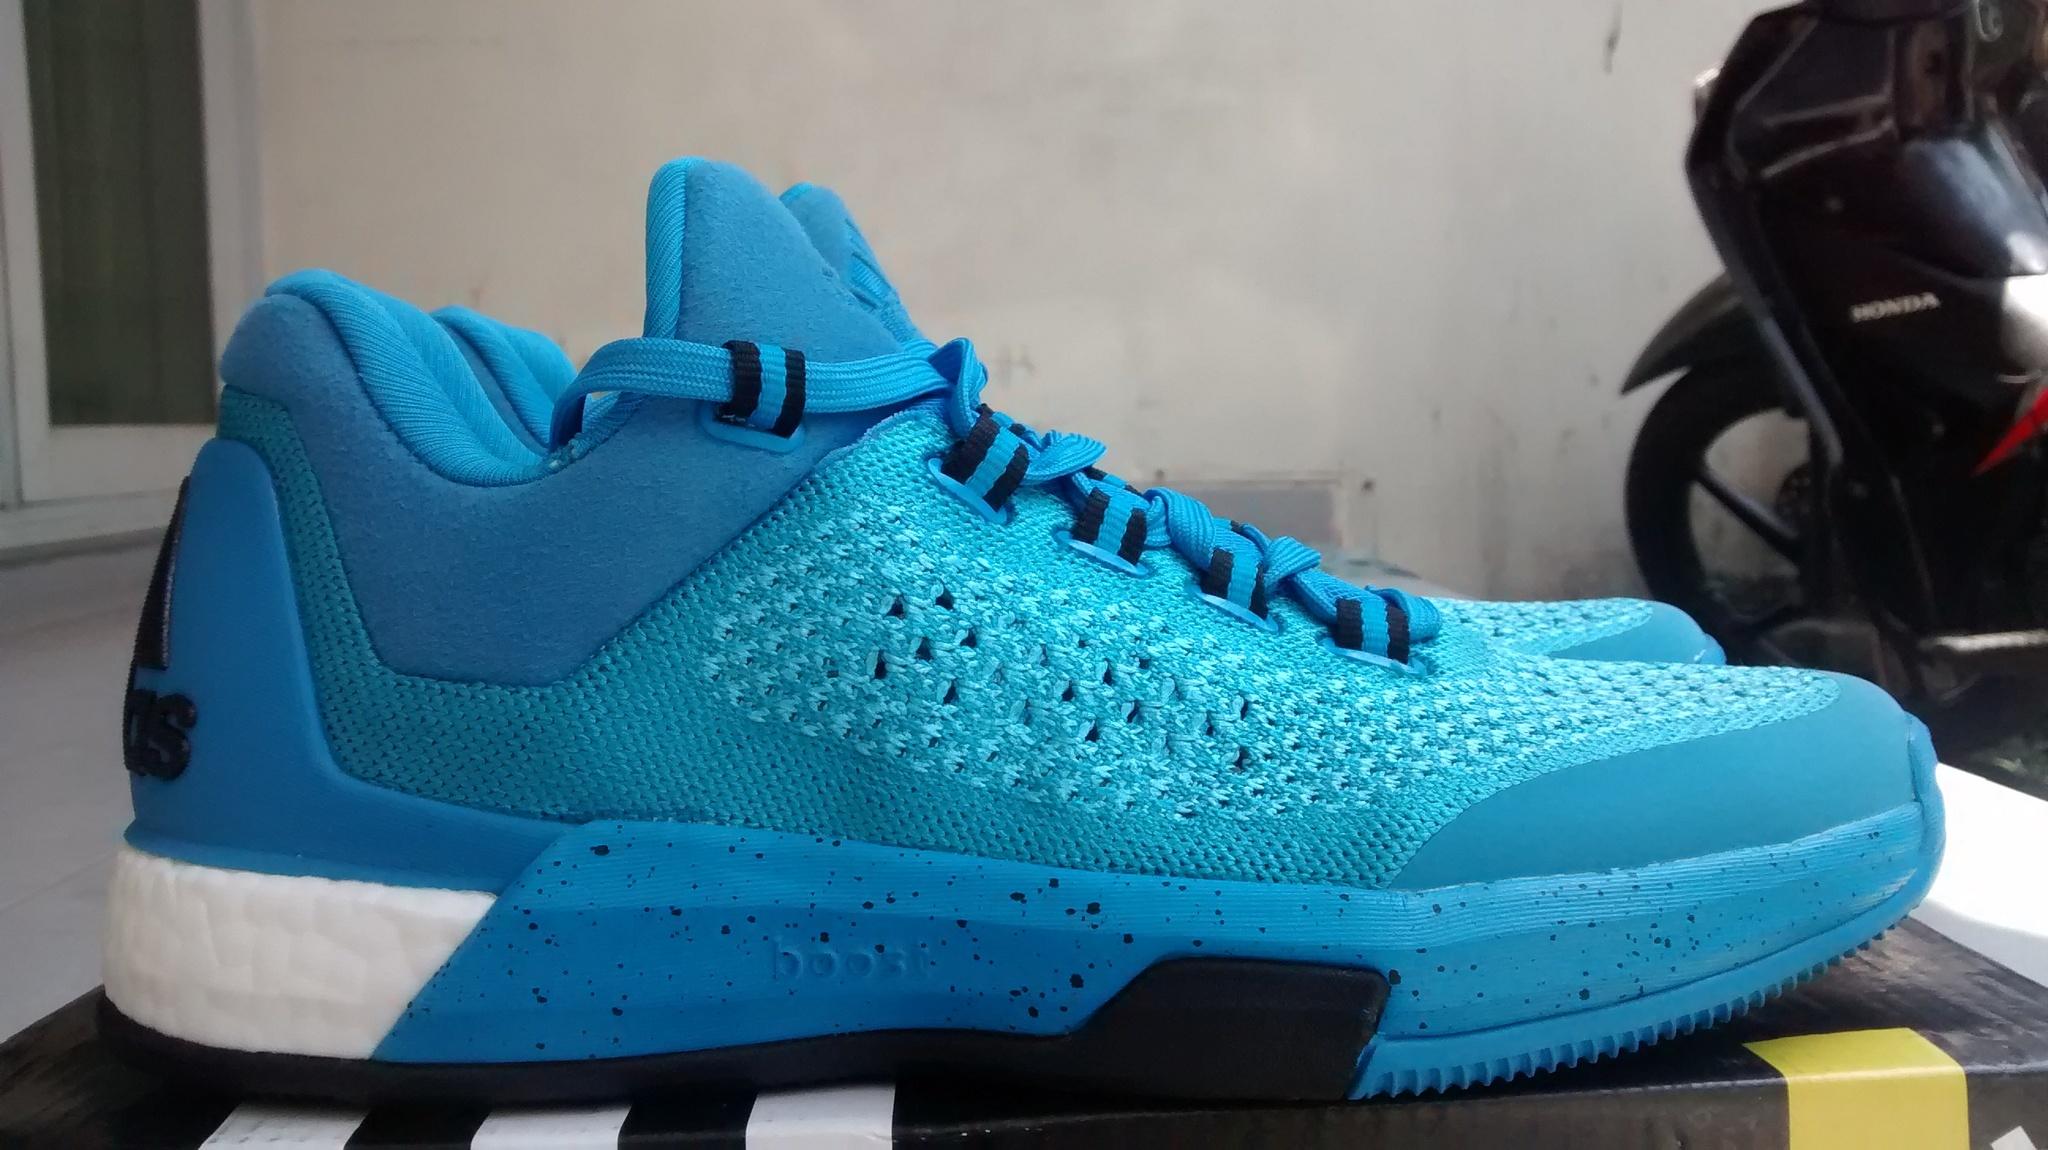 on sale b035c cd9e0 ... wholesale sepatu basket adidas crazylight boost low 2015 blue . 006dc  5cfb6